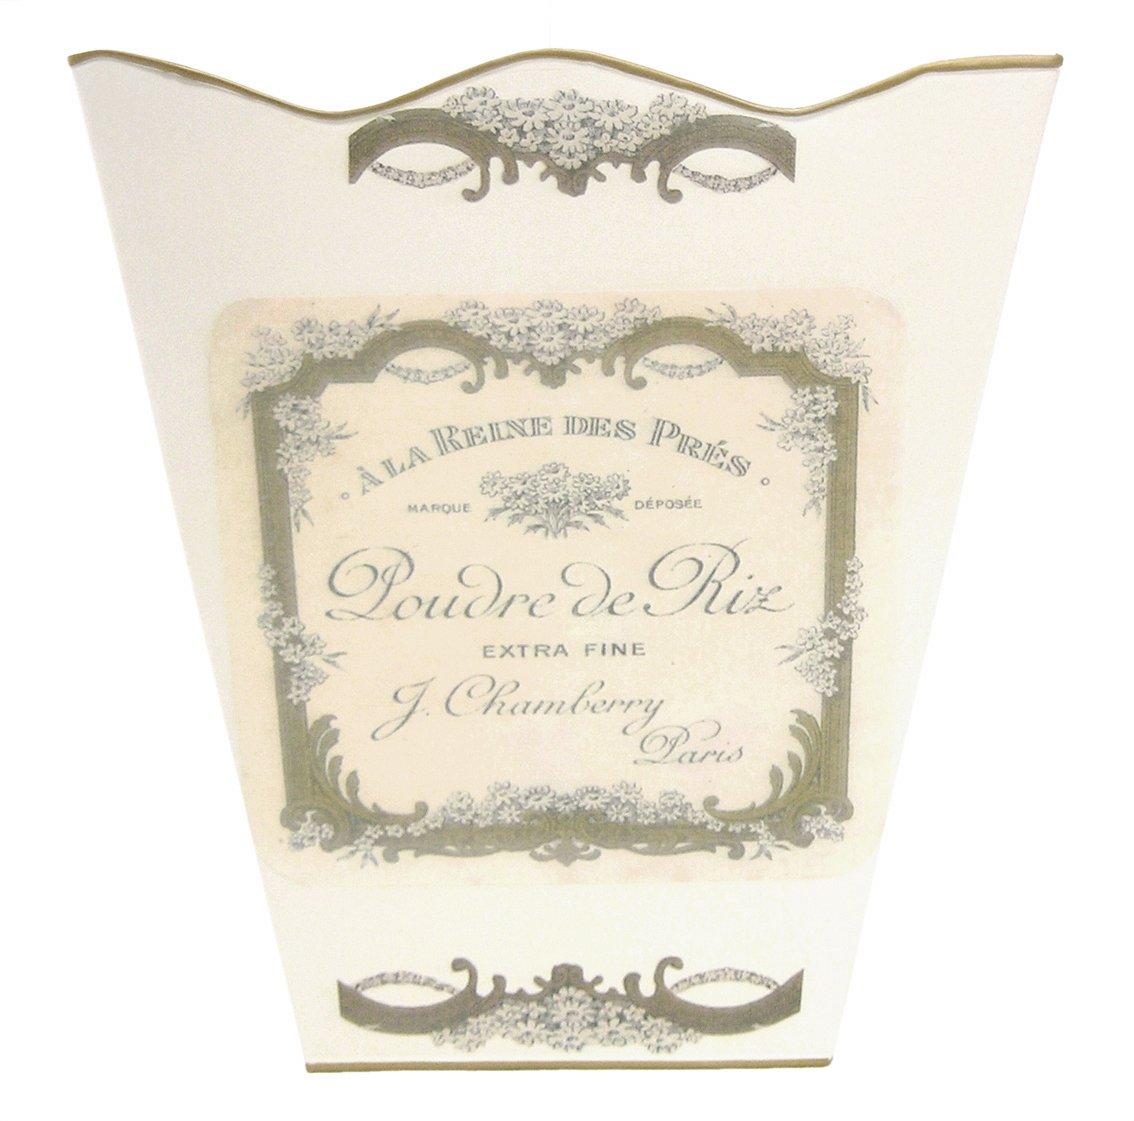 Retro Vintage Wastebasket E13 Trash Can, Trash Bin, Trash Basket ~ Shabby Chic Ivory Enamel with Vintage French Perfume Label. 1